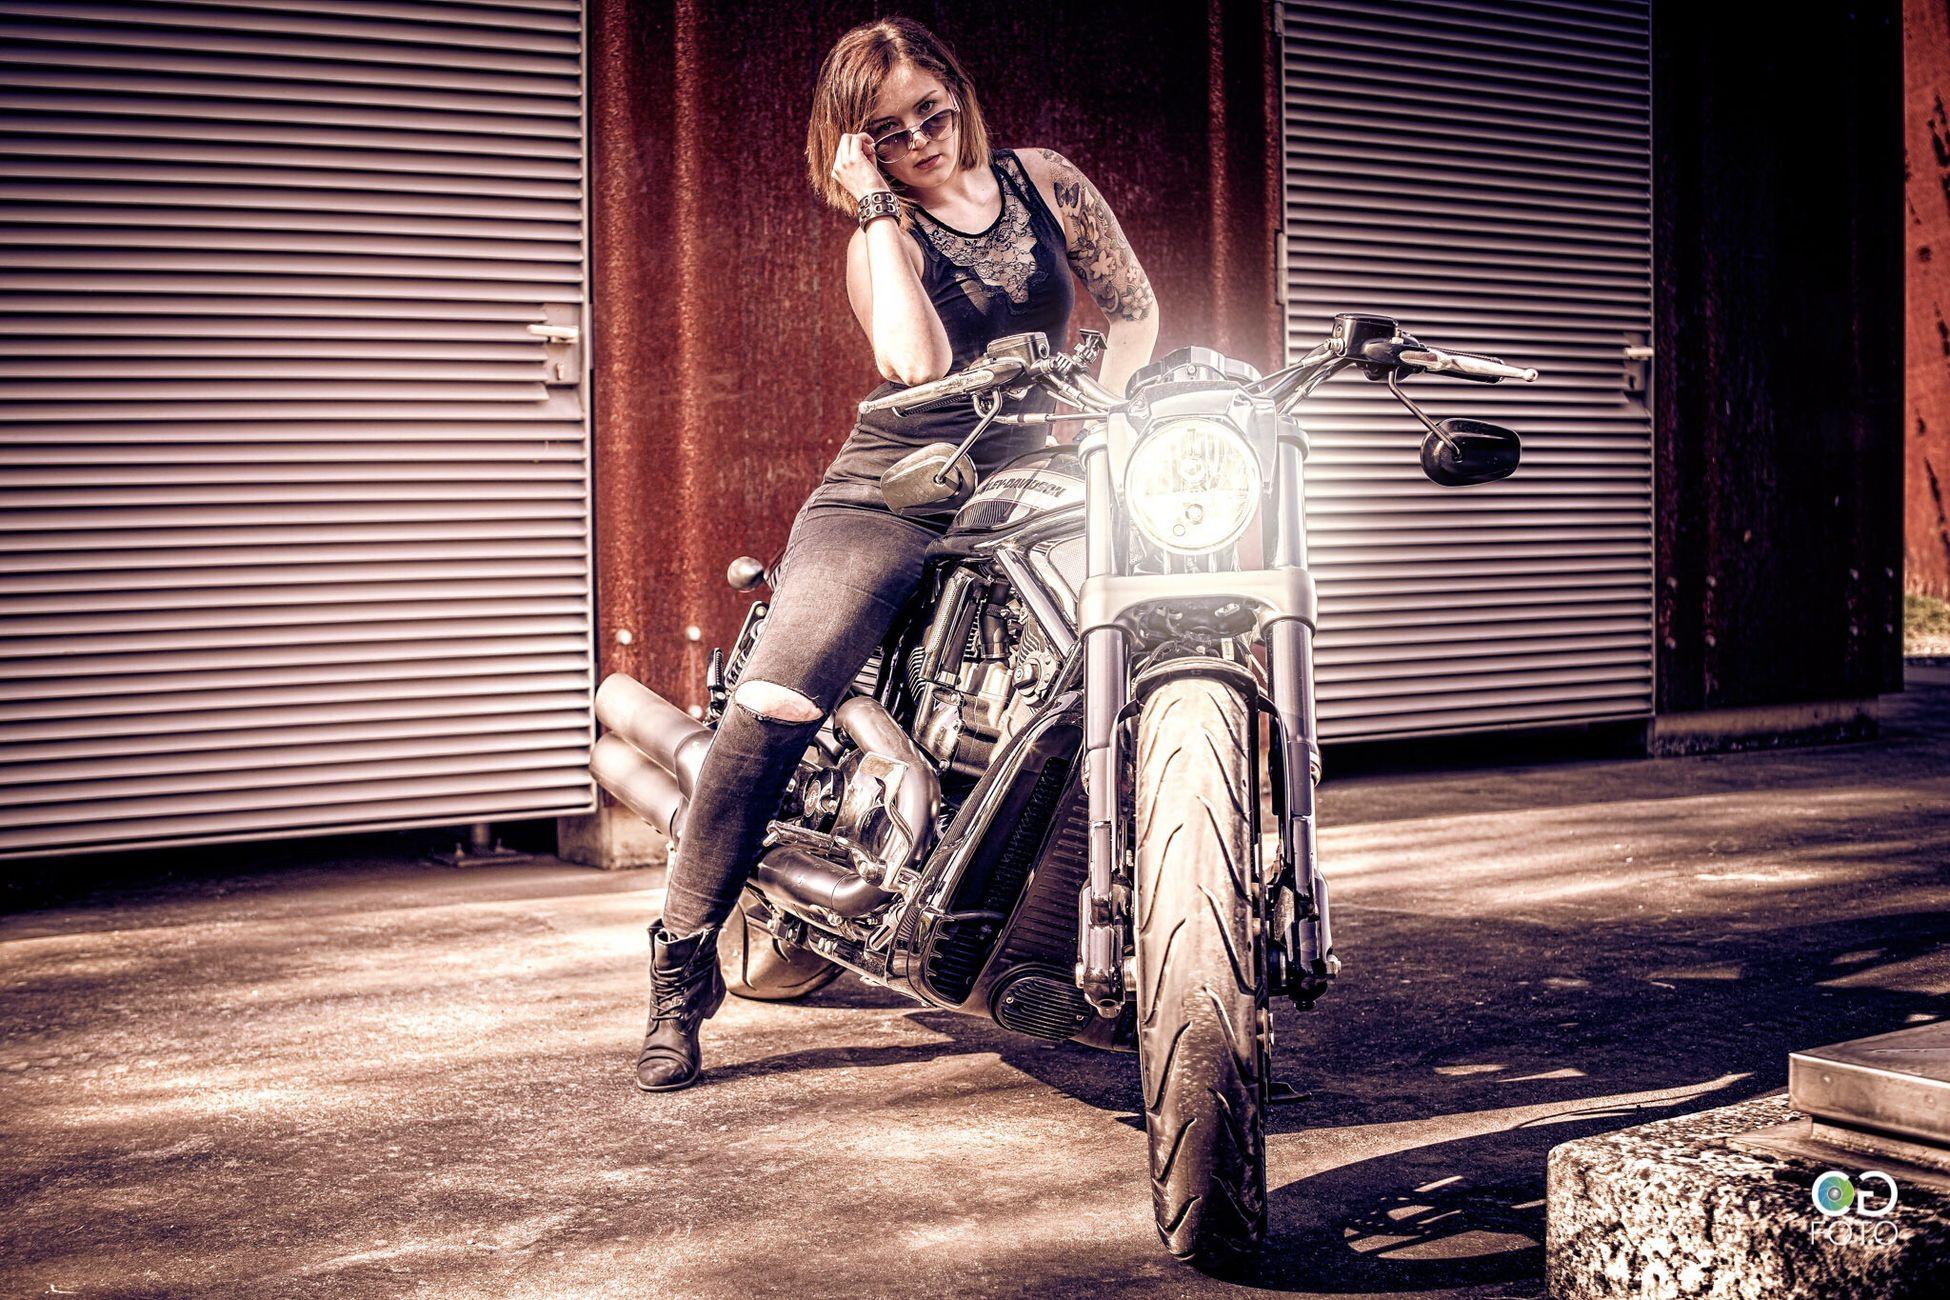 Motorcycle One Person Adult People Biker Women Beautiful People Outdoors Bochum Harleydavidson Sexygirl Shooting Photography Photooftheday Germany Sunlight Weather